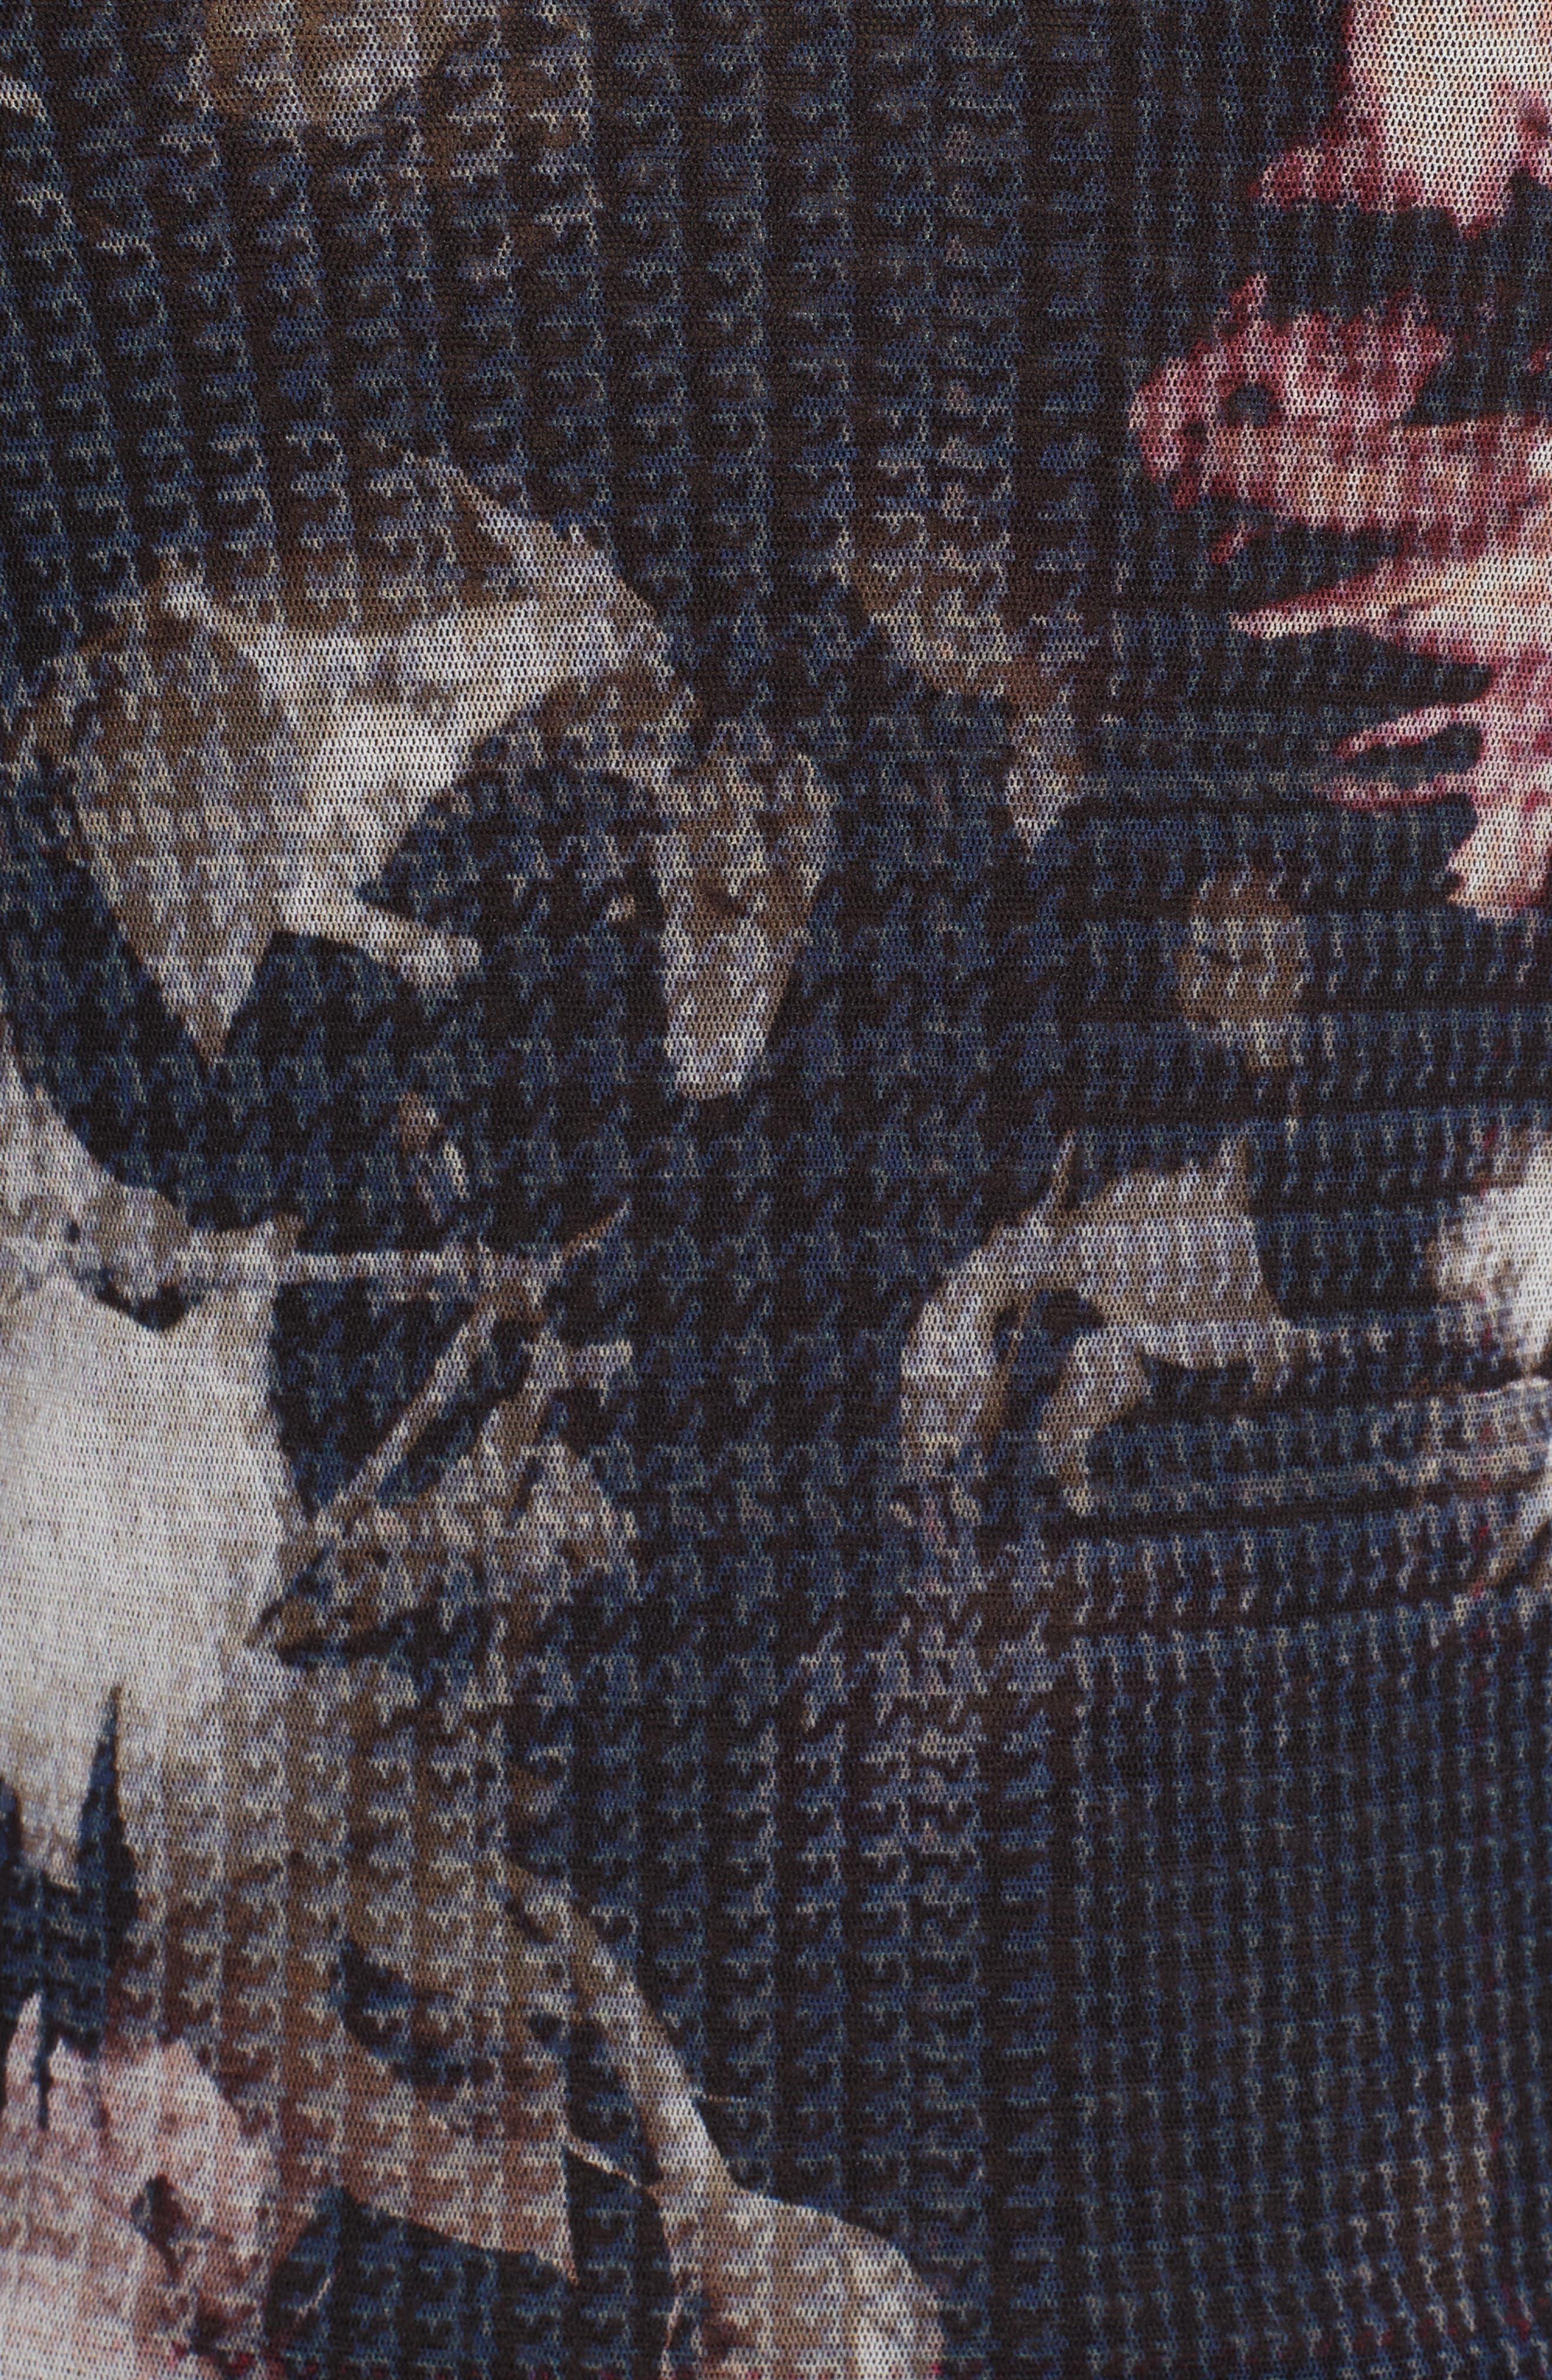 Floral Print Tulle Off the Shoulder Top,                             Alternate thumbnail 5, color,                             001